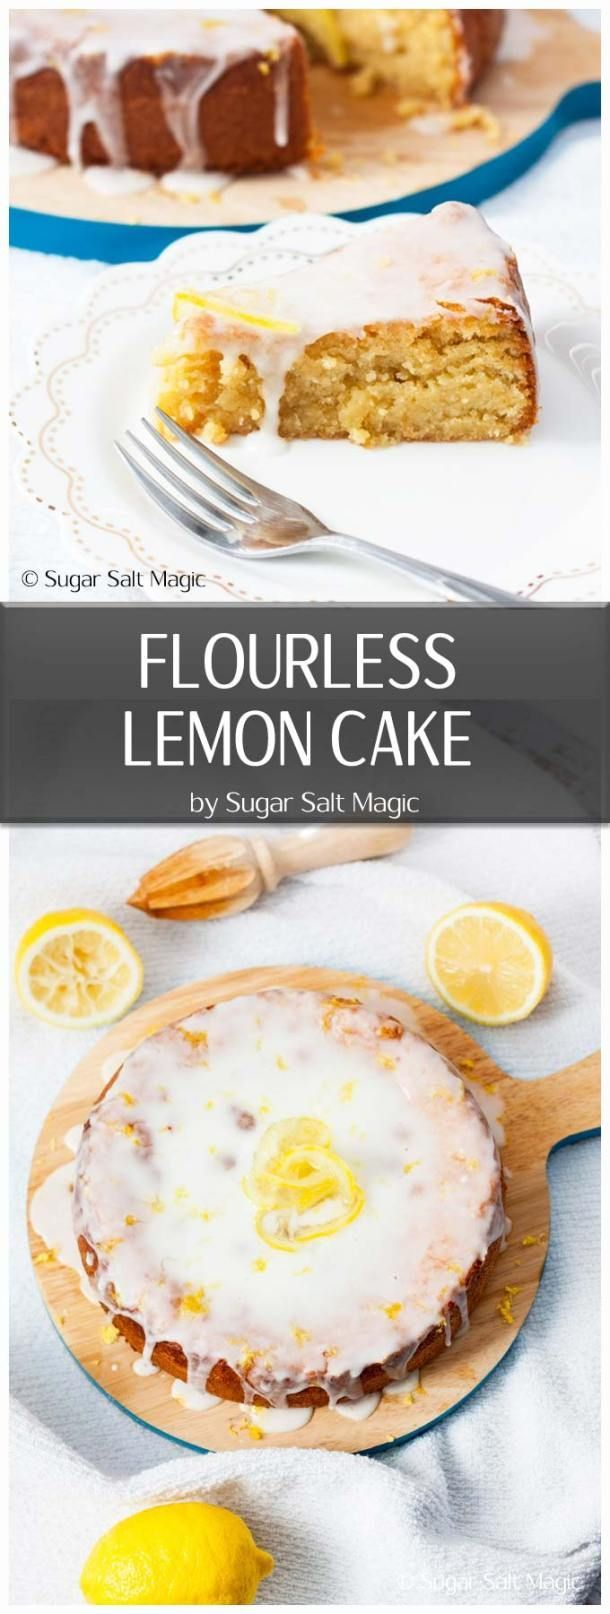 Flourless Lemon Cake